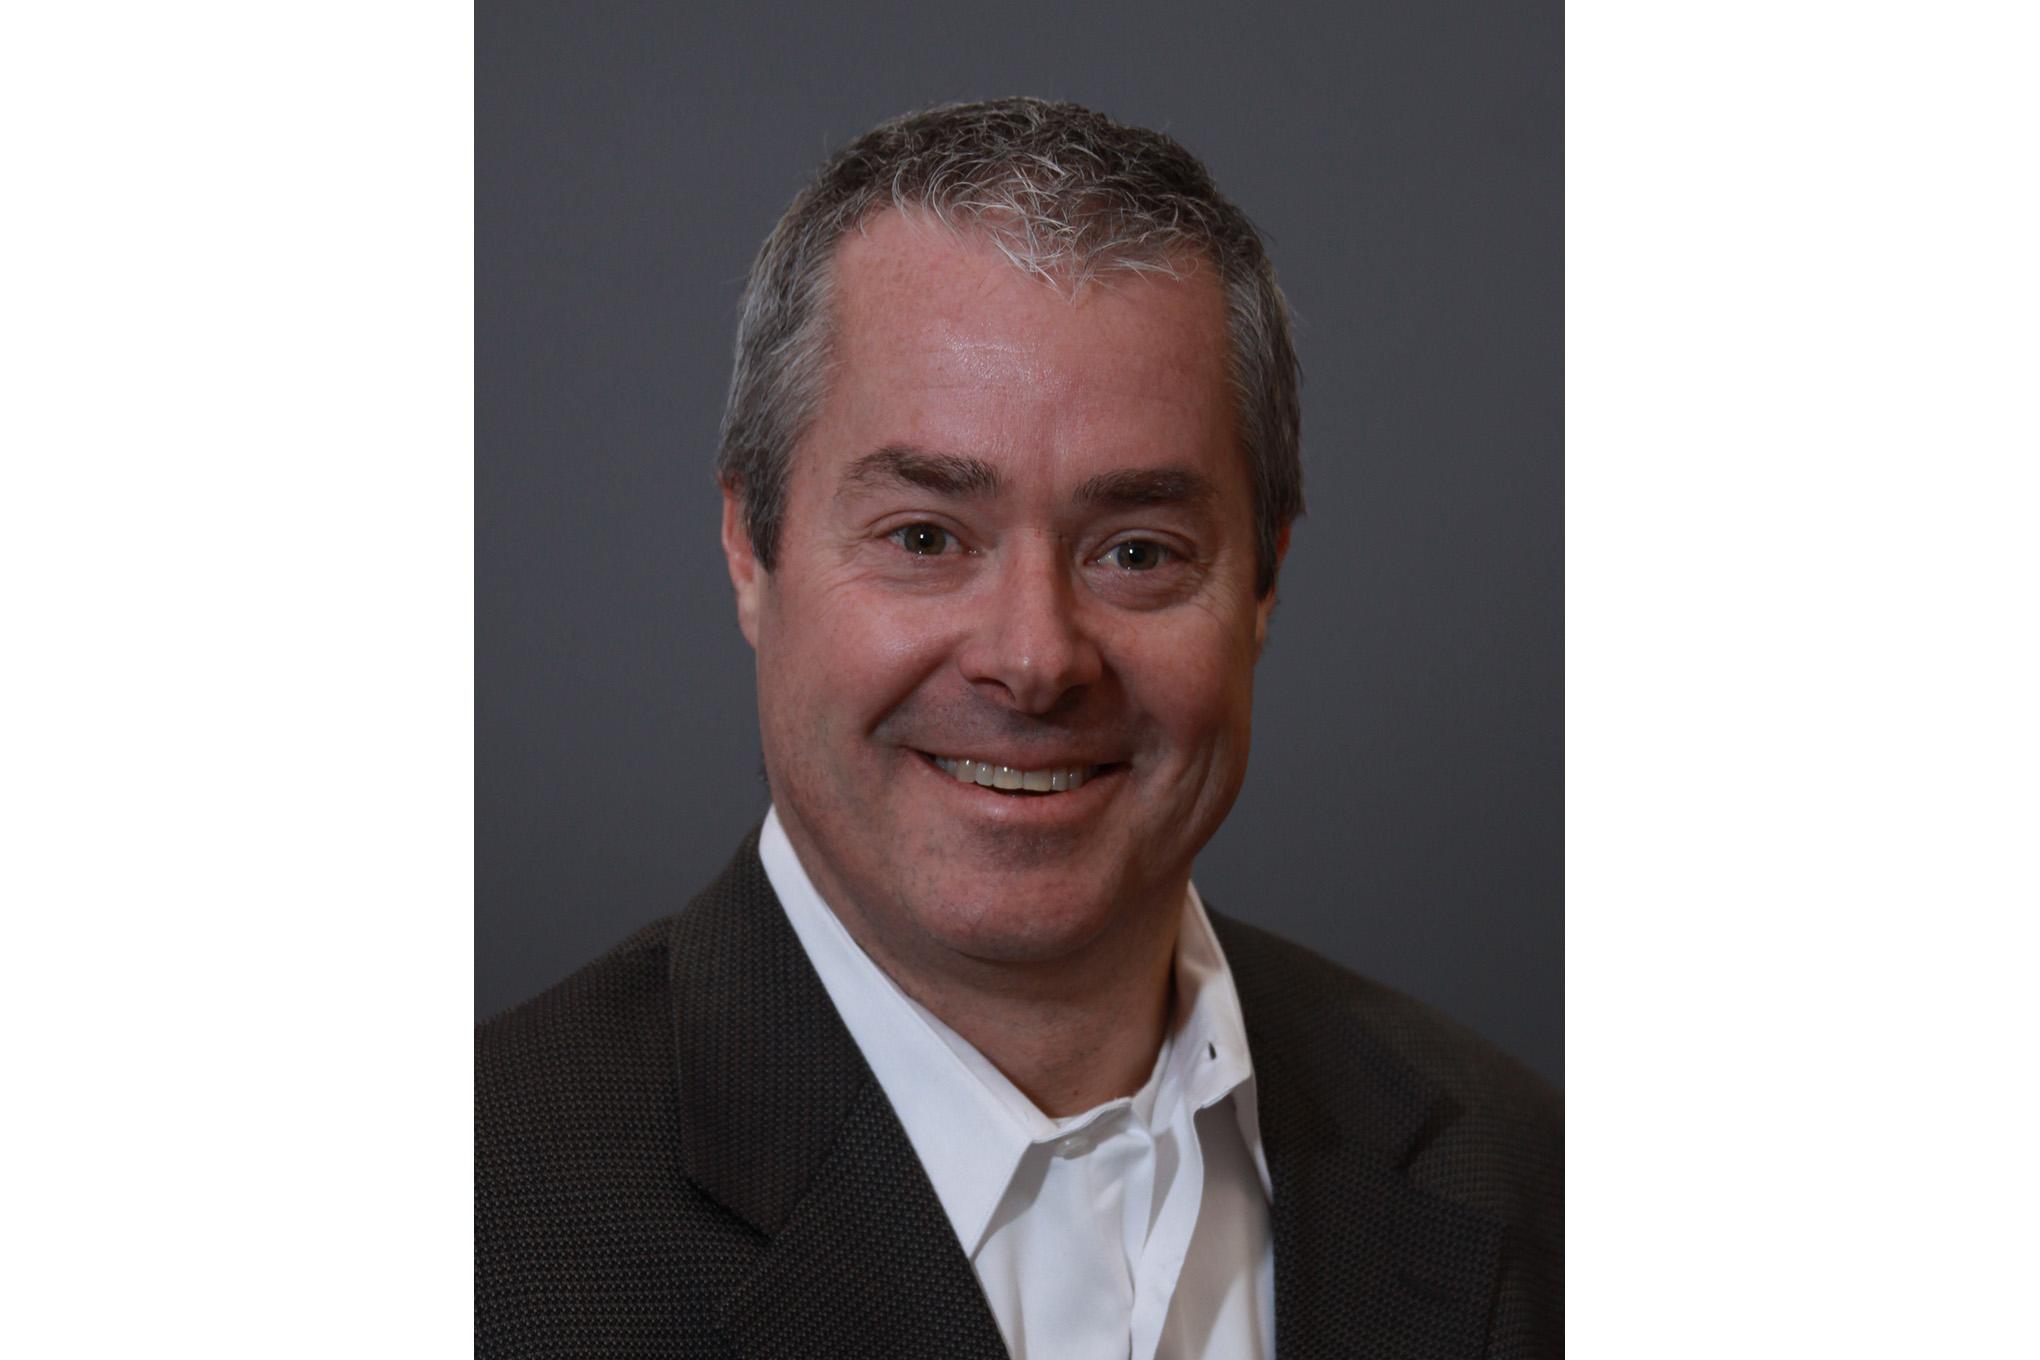 Agilis Welcomes David Grimes as Executive Vice President